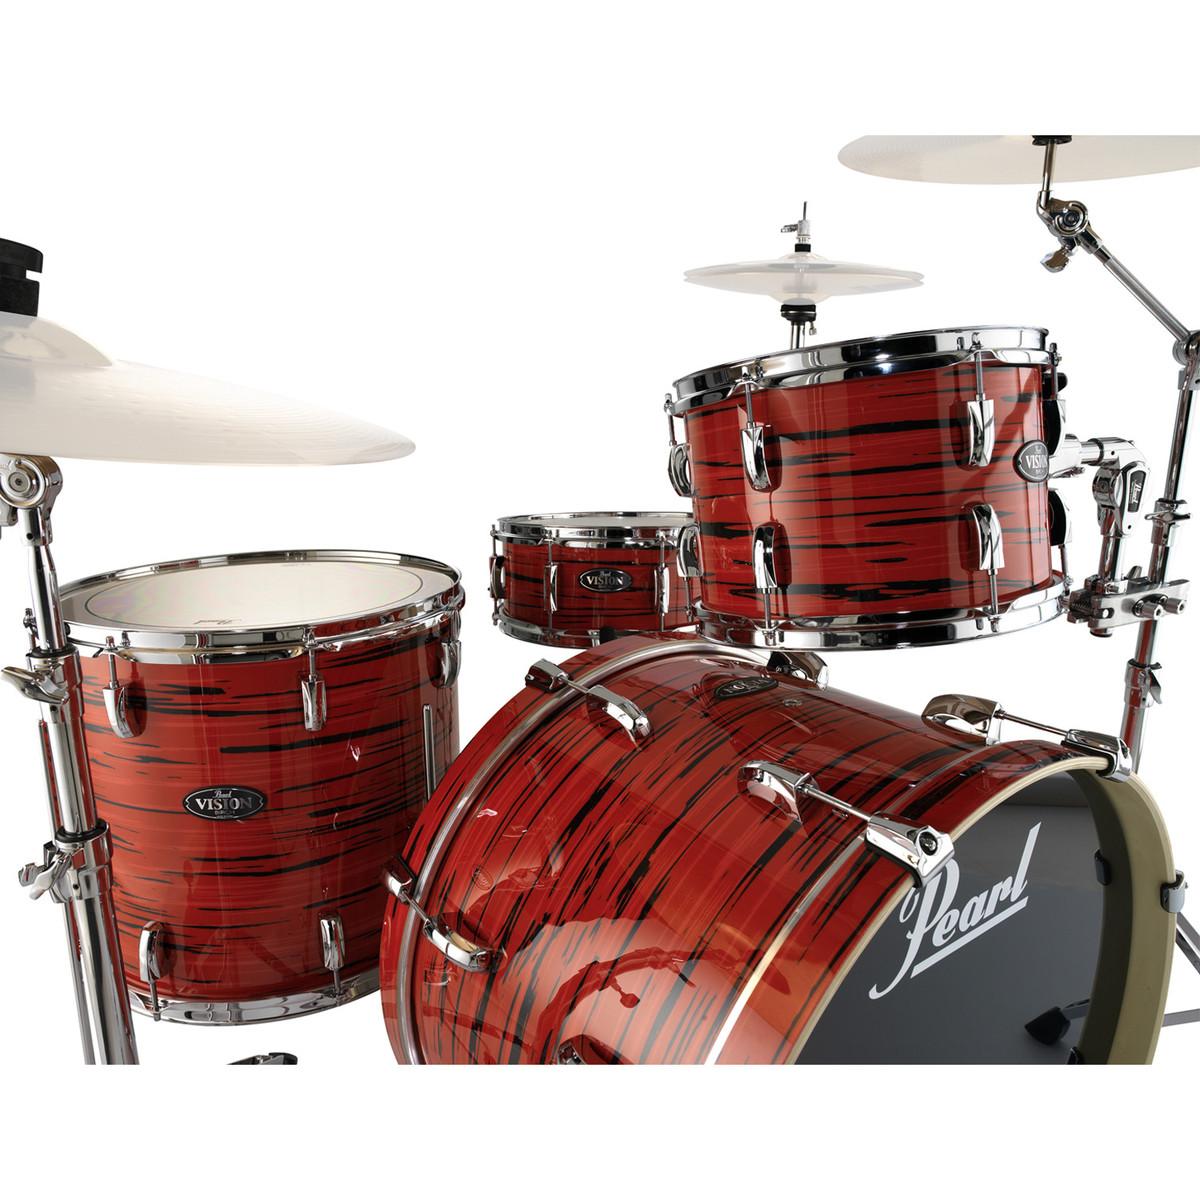 pearl vision birch vba ltd edition 22 39 39 drum kit tiger red at. Black Bedroom Furniture Sets. Home Design Ideas